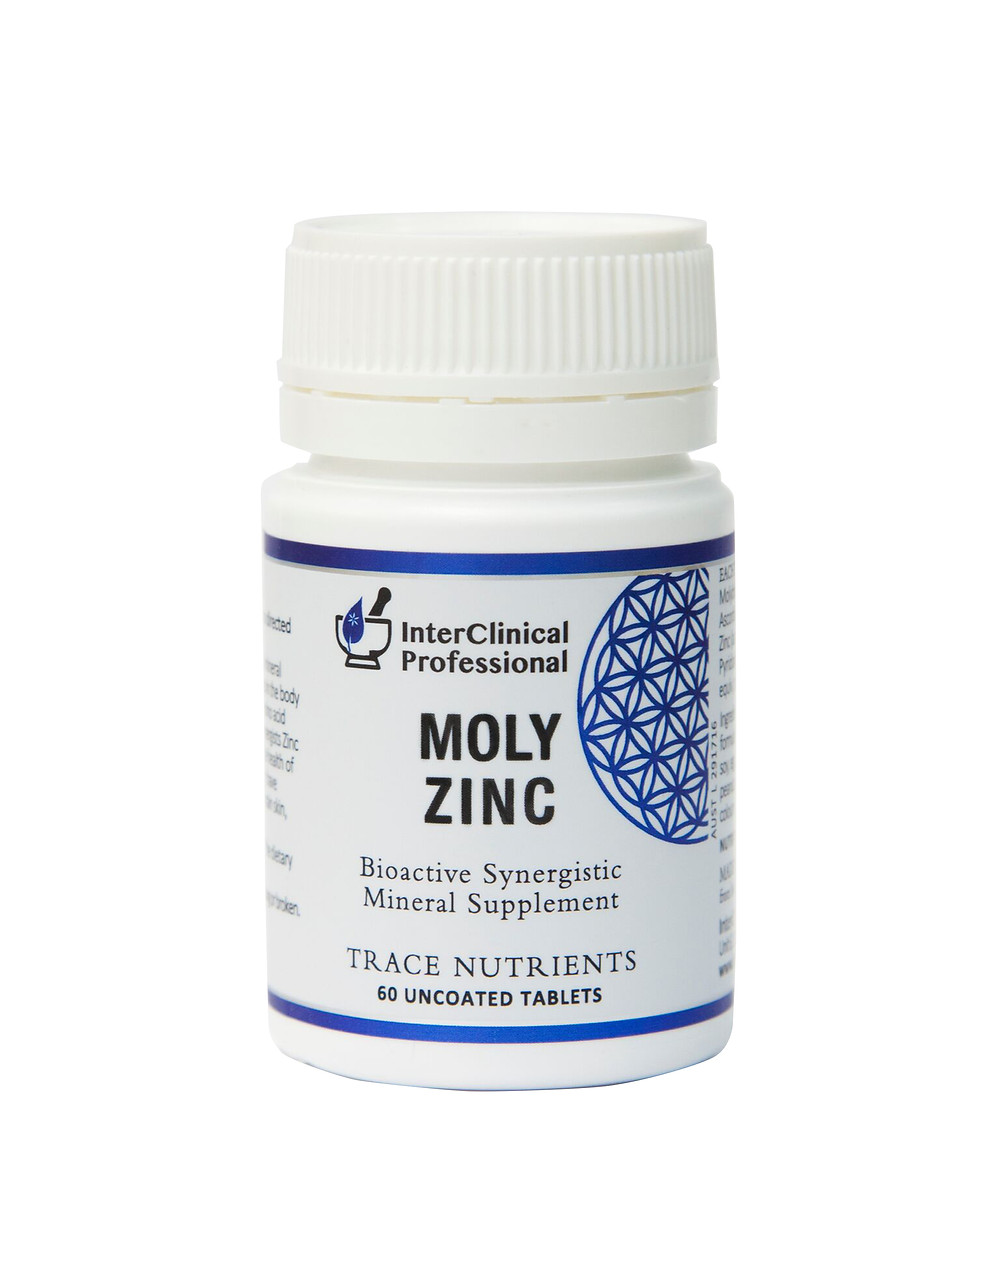 Interclinical Professional Molyzinc